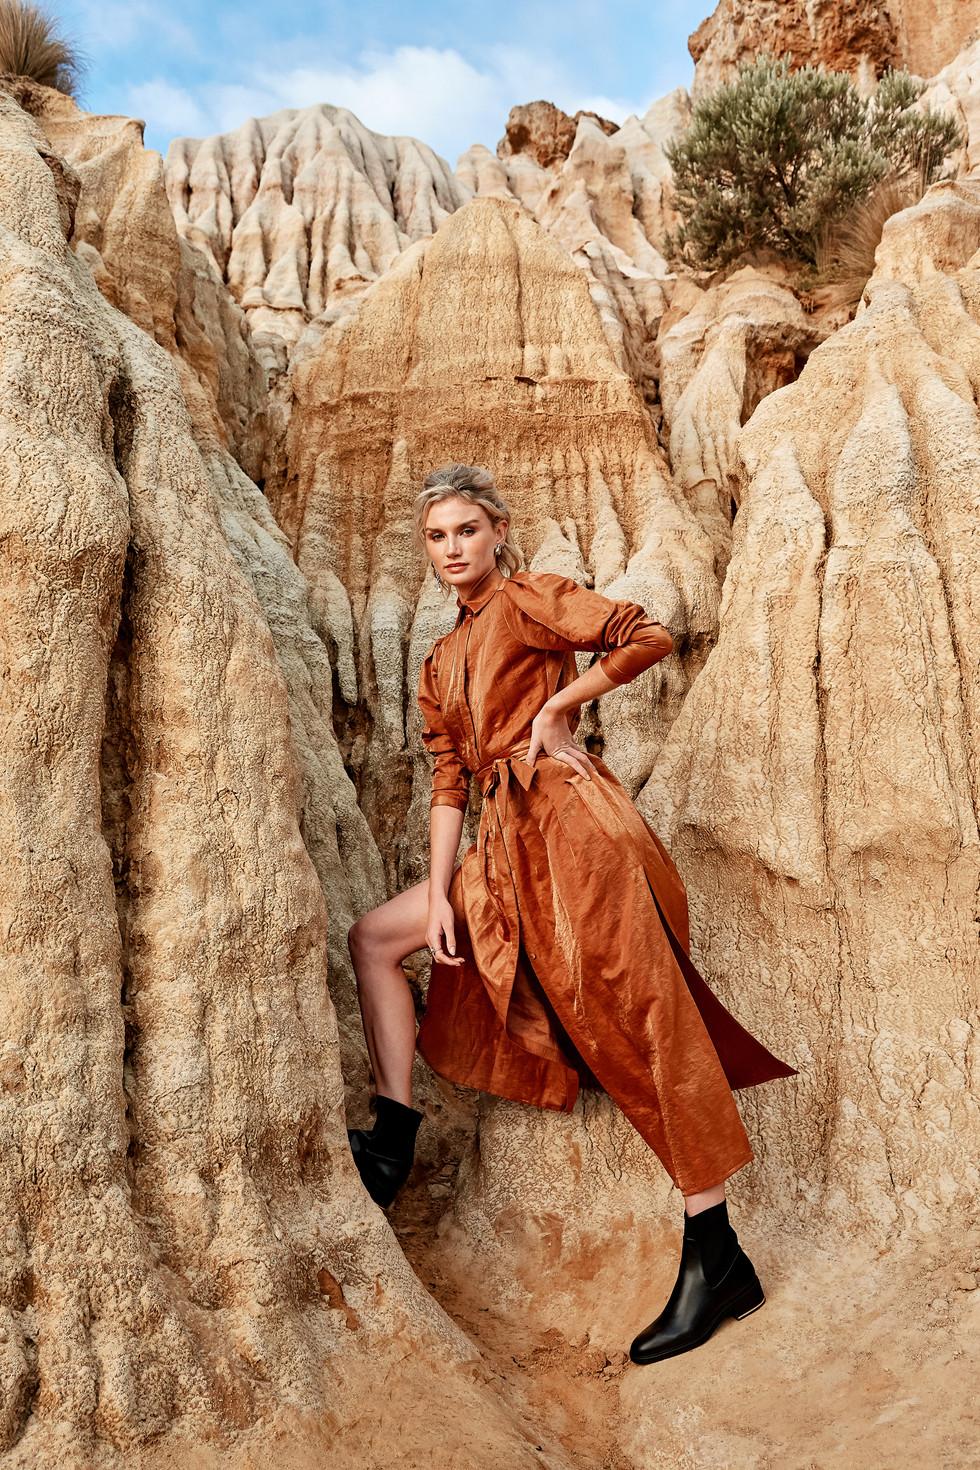 Amy Pejkovic @ IMG Models